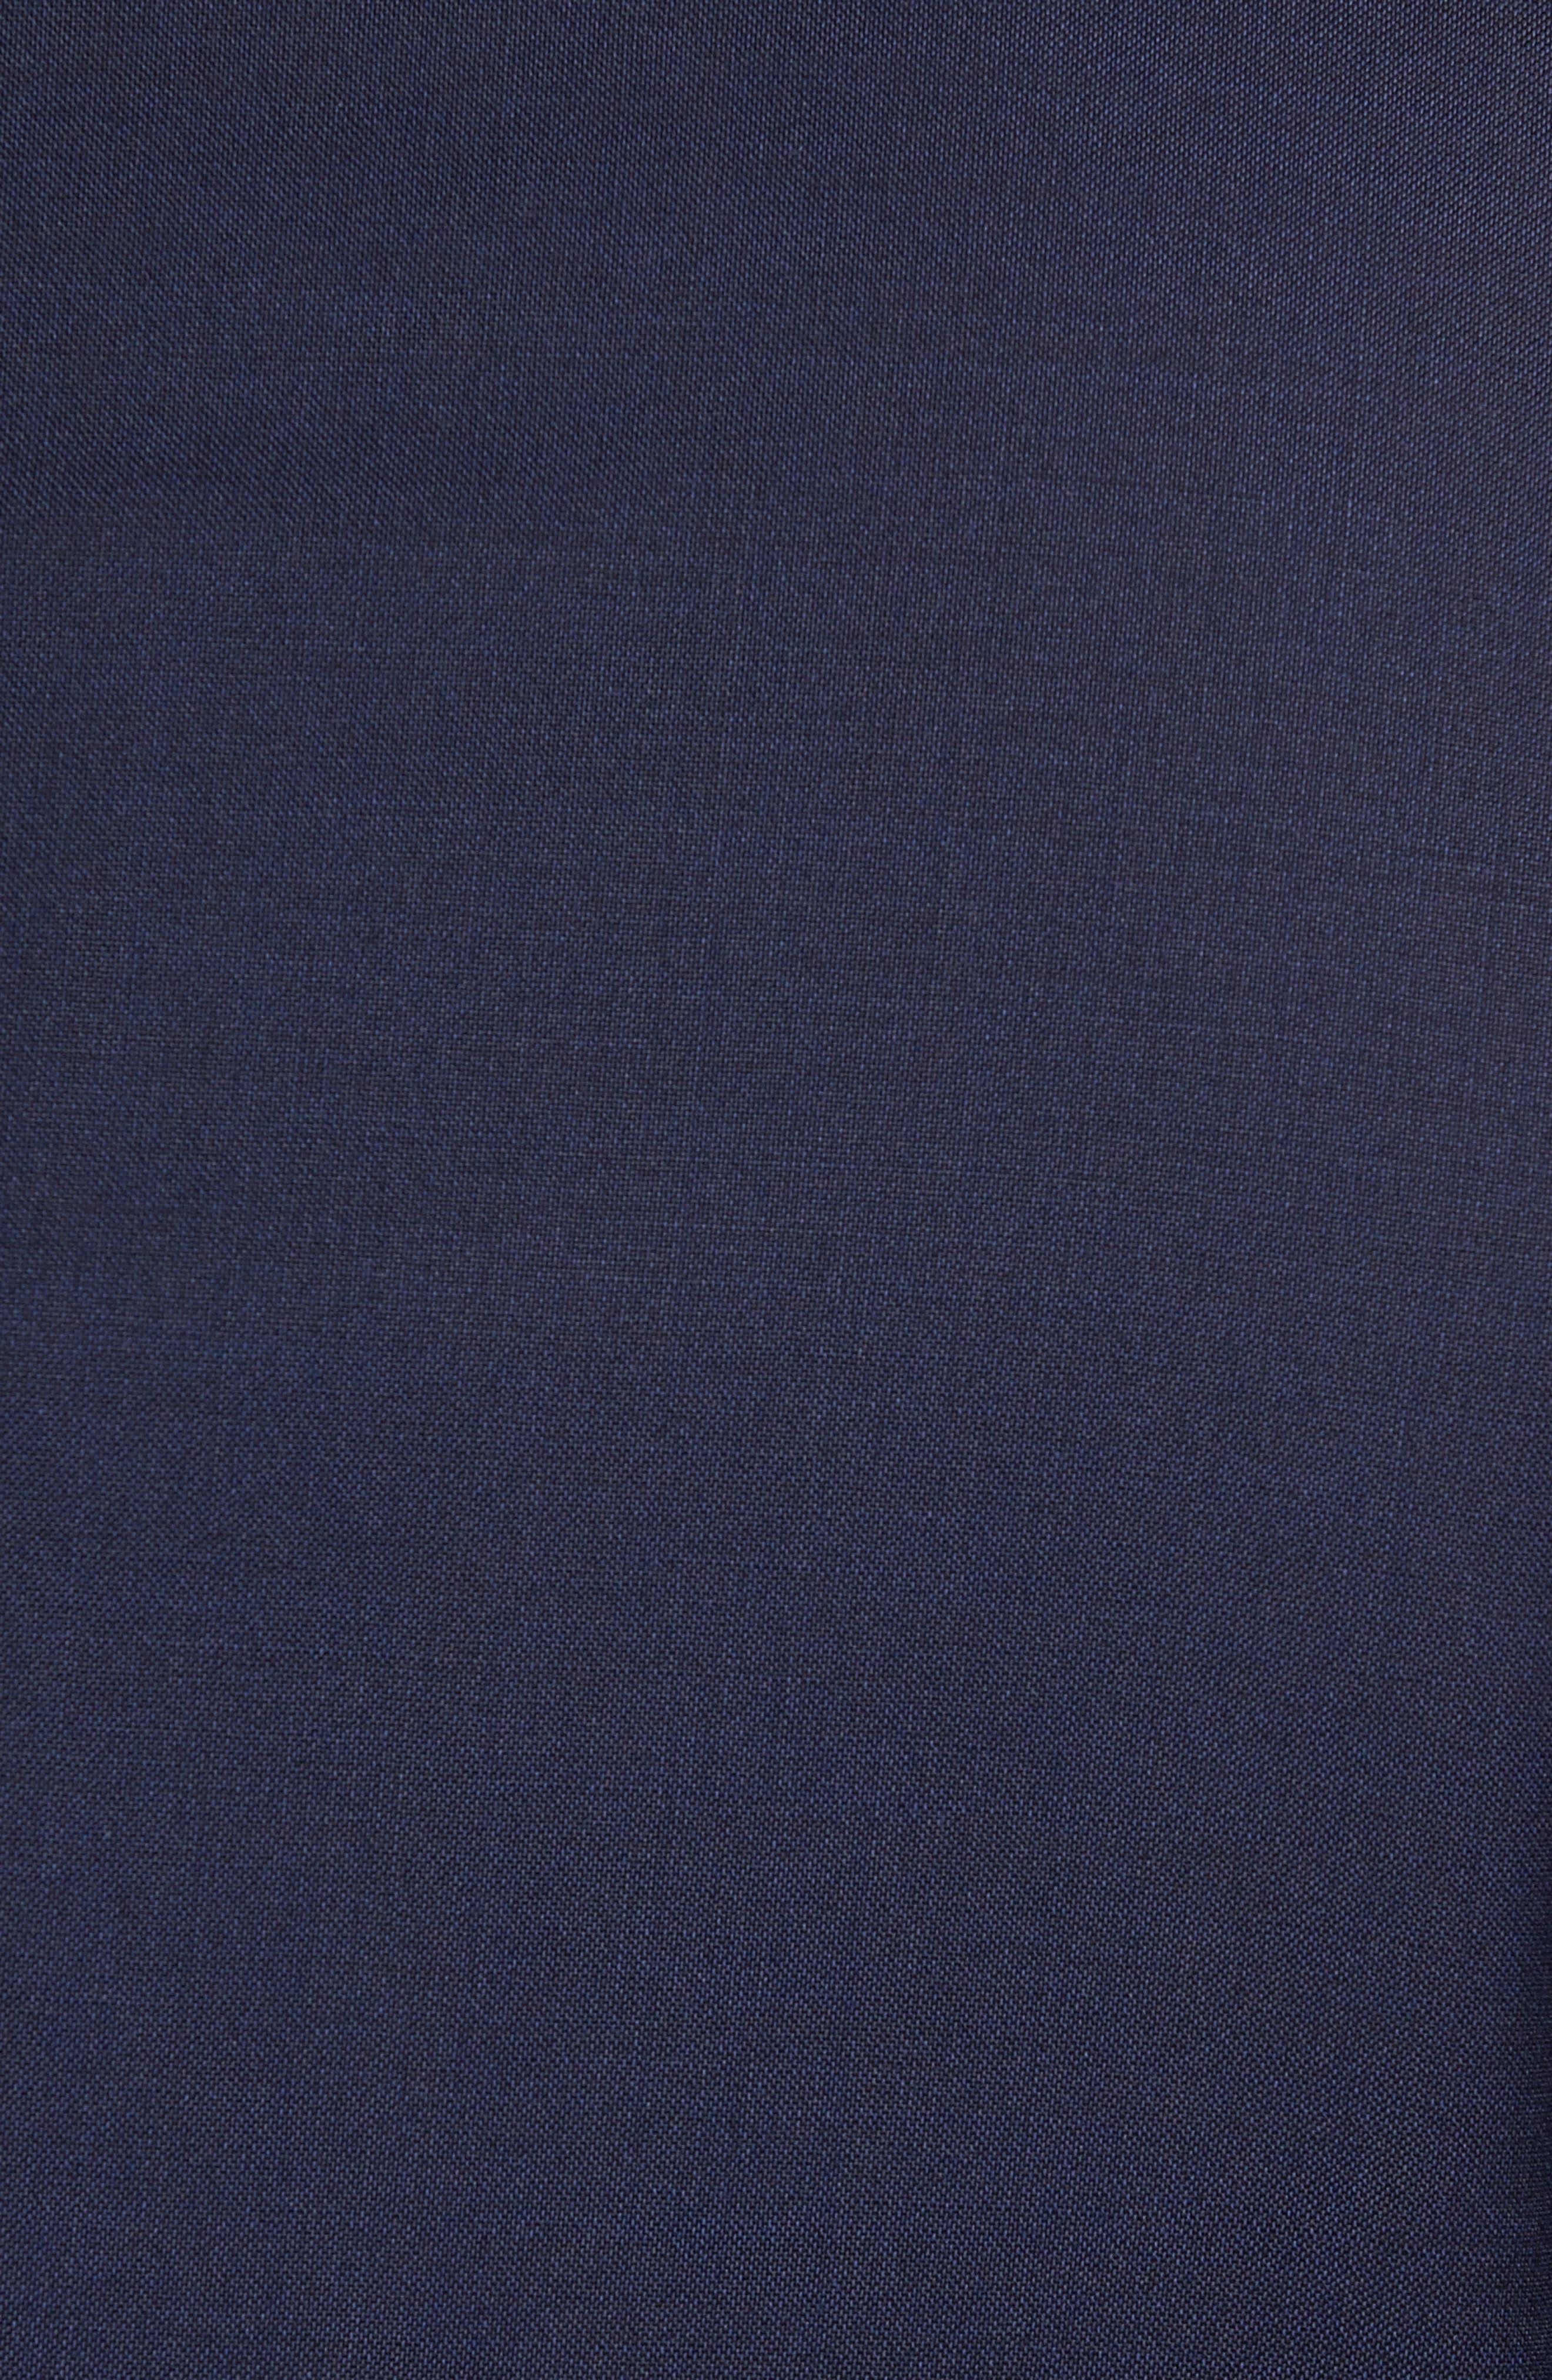 BOSS, Huge/Genius Trim Fit Navy Wool Suit, Alternate thumbnail 7, color, 410